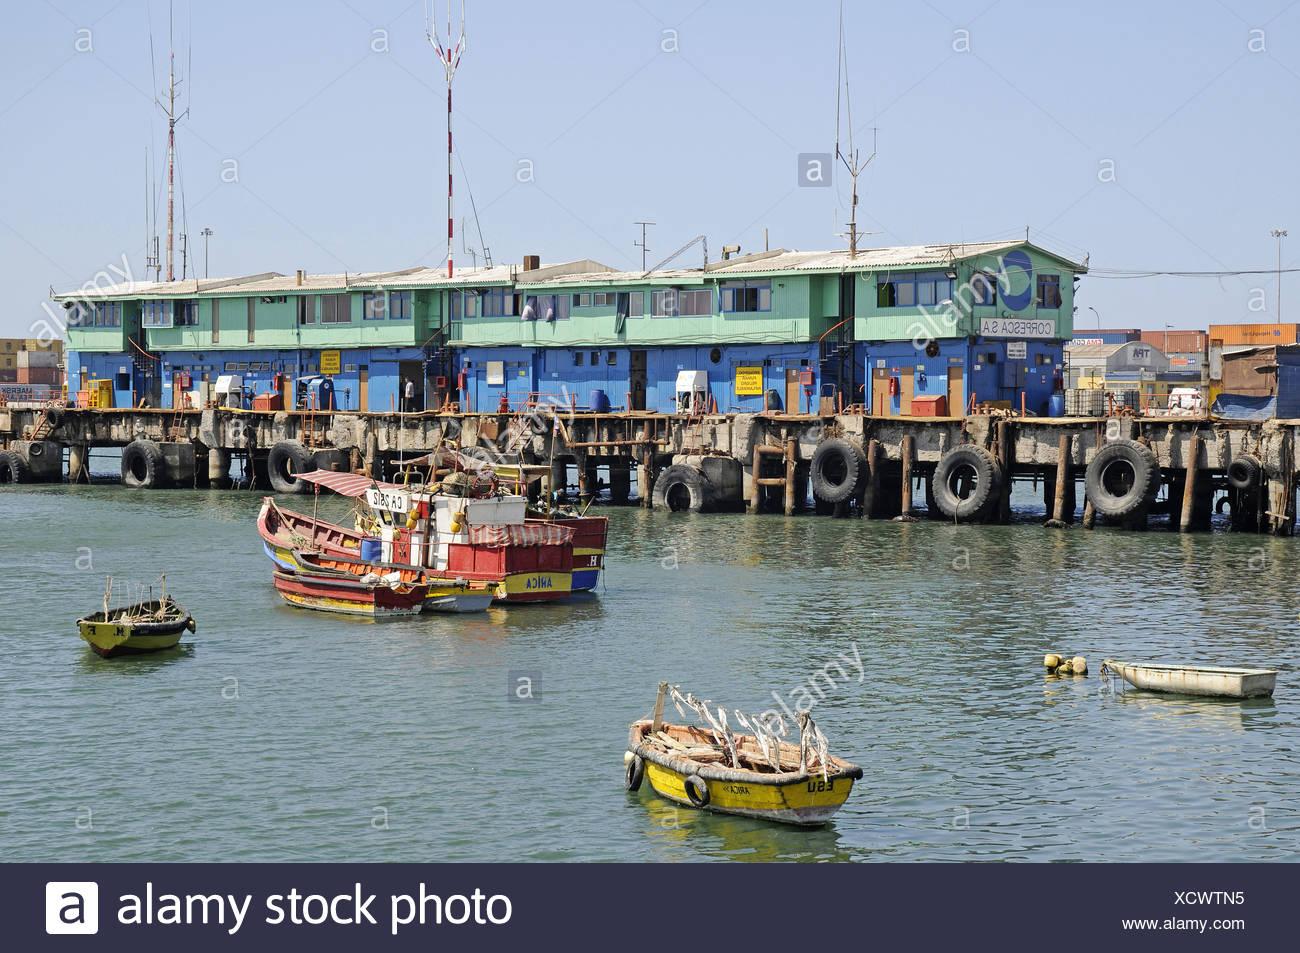 Small boats - Stock Image